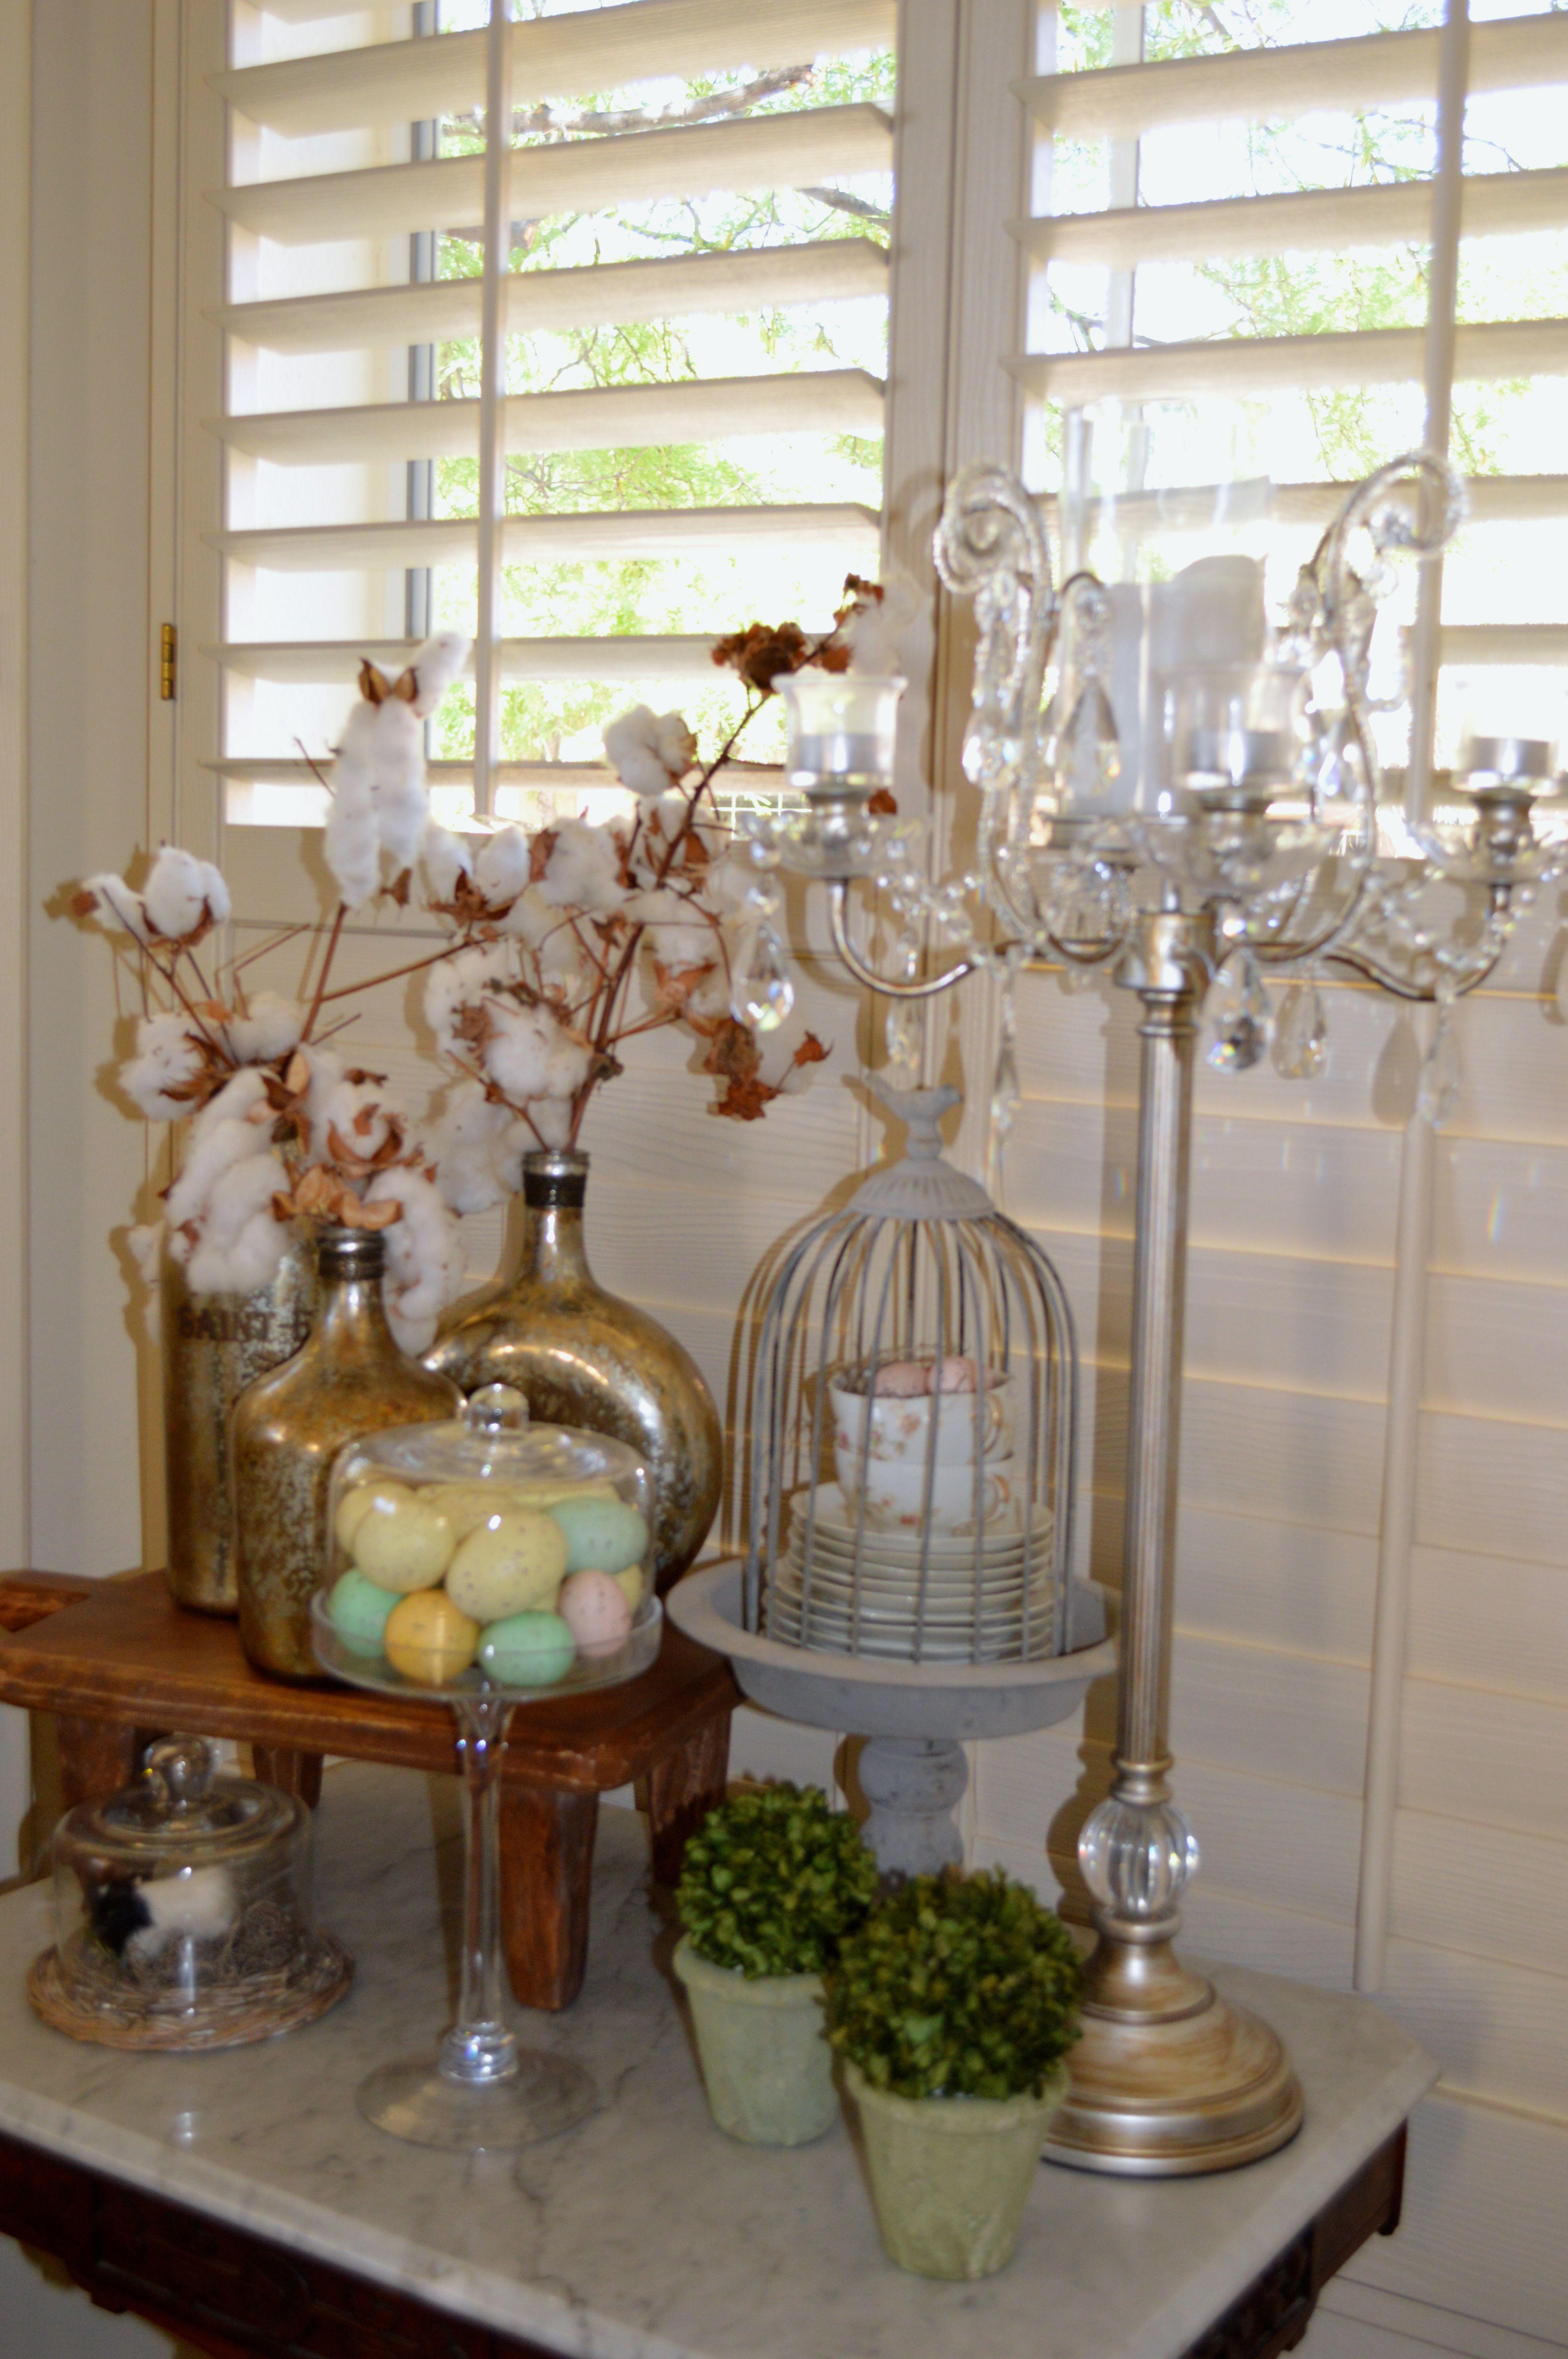 Pin It Like Image Home Decorators Catalog Best Ideas of Home Decor and Design [homedecoratorscatalog.us]